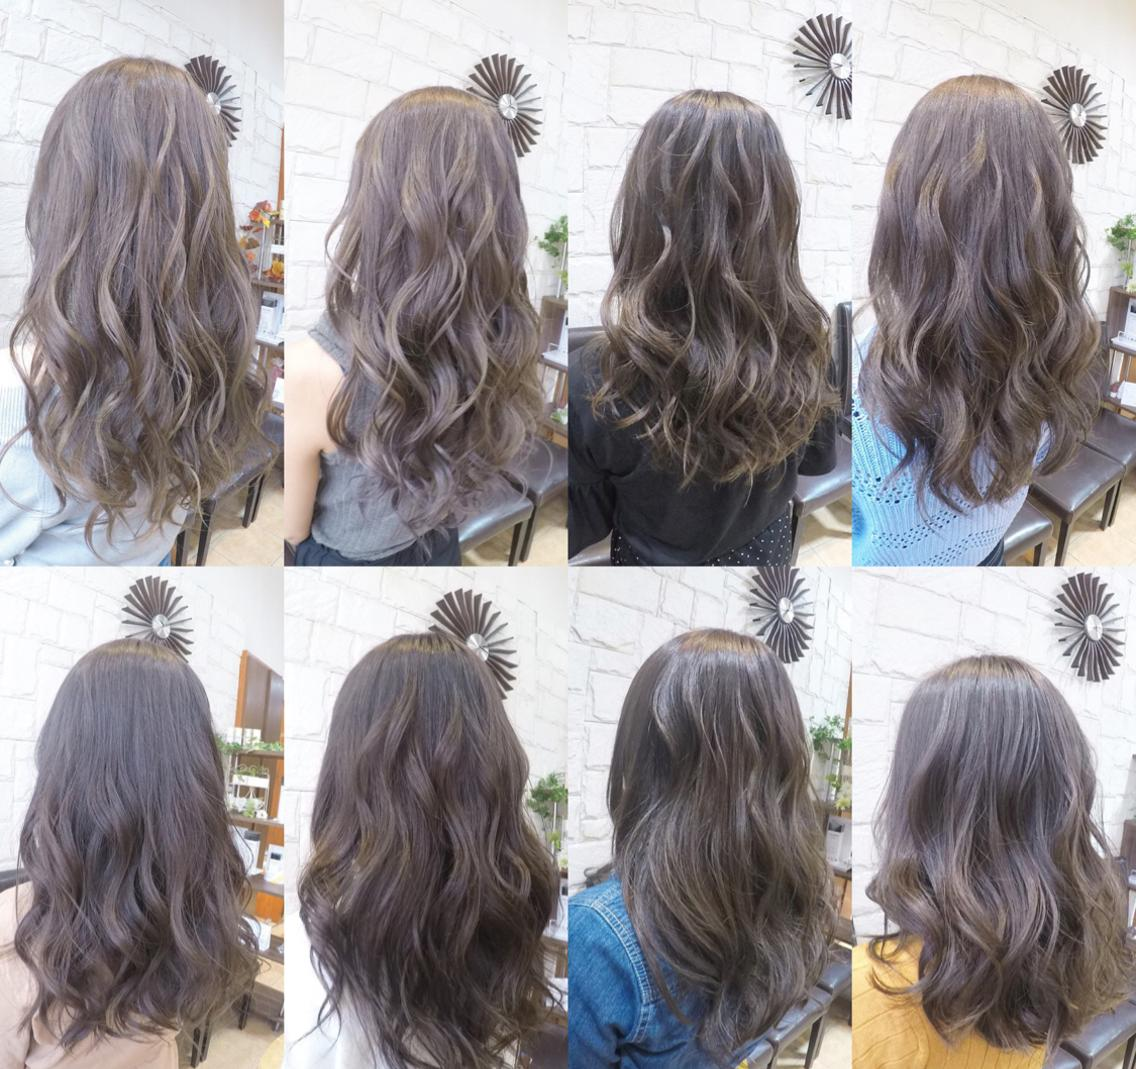 Dejave hair&space西千葉店所属・🎃布施直也🎃絶対に可愛く❤️🎃の掲載